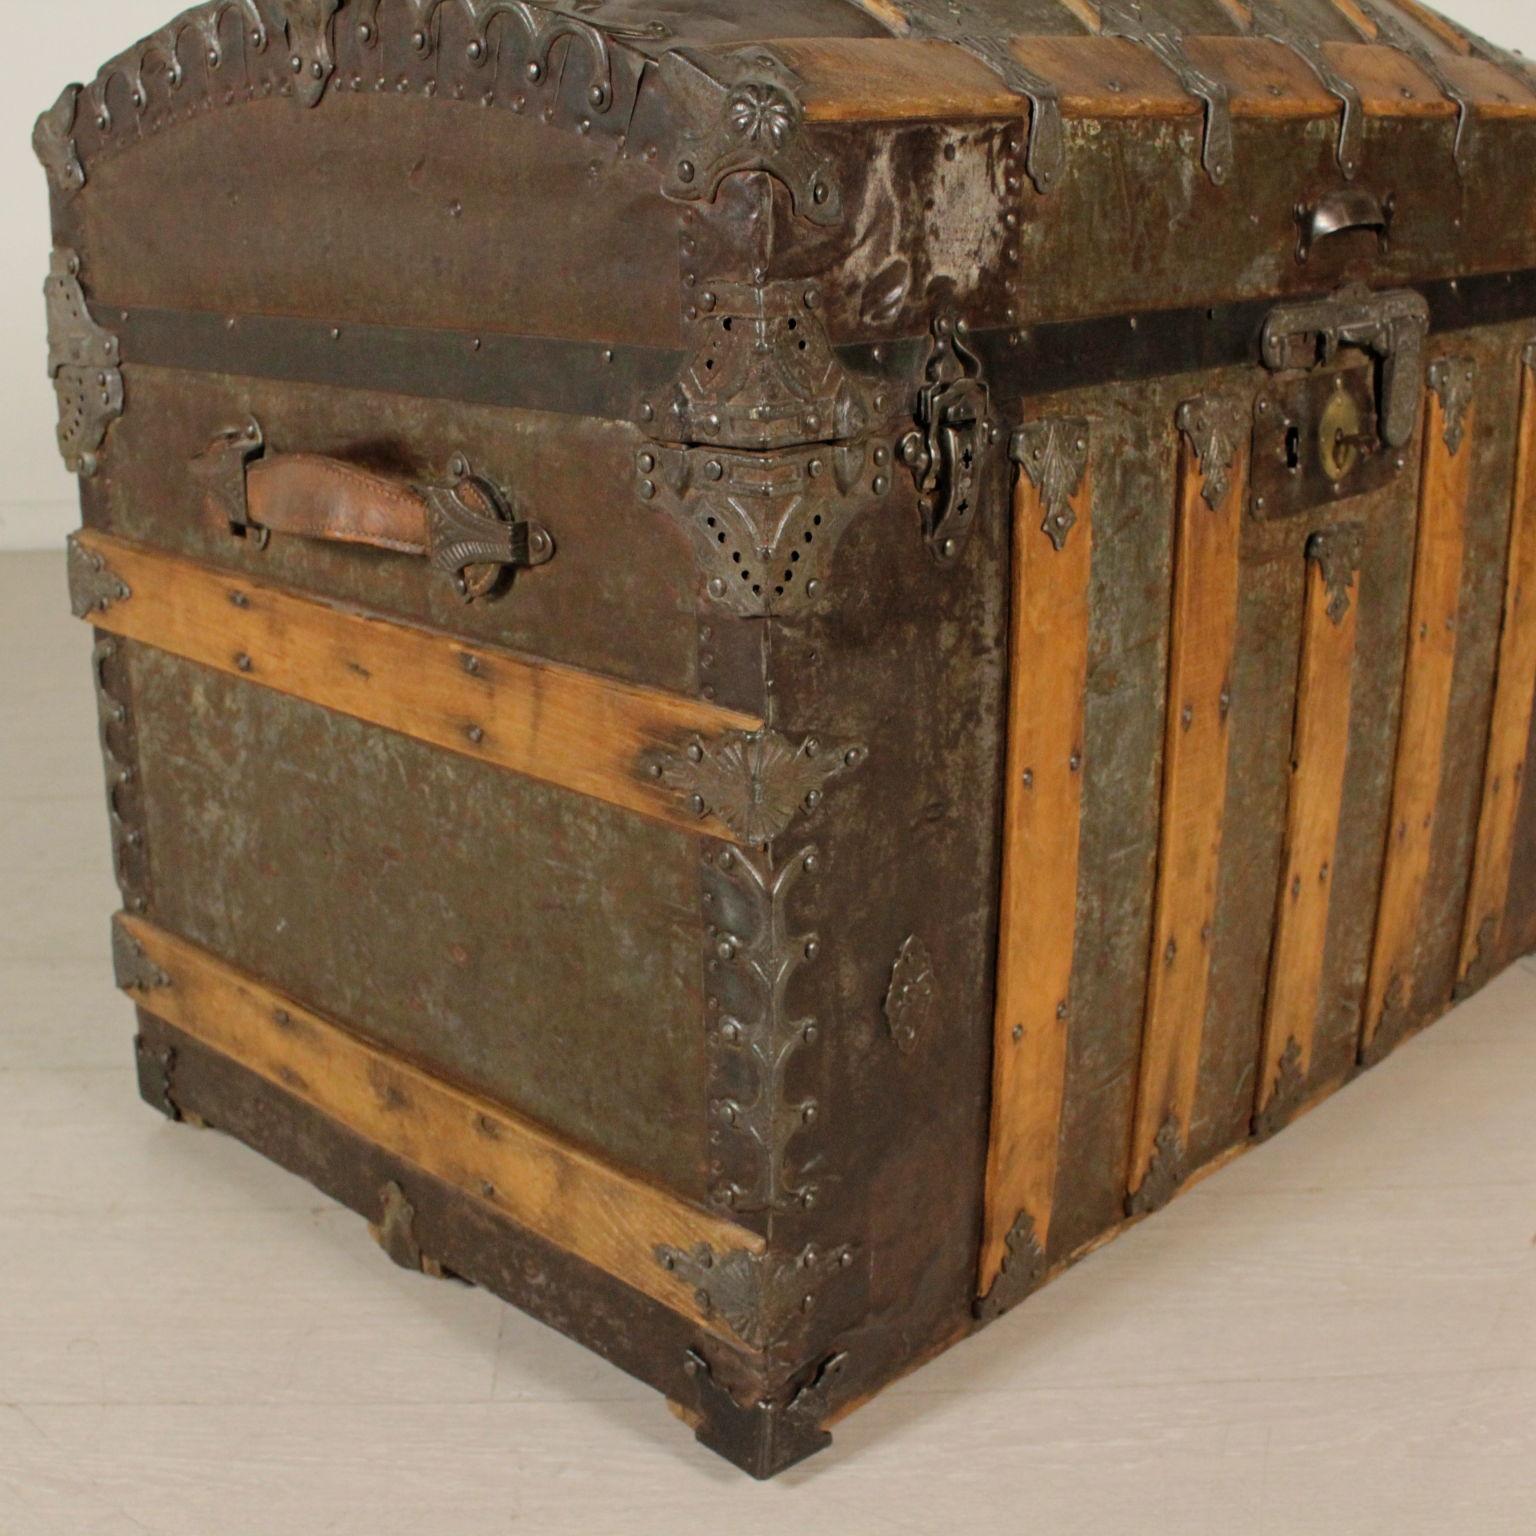 Baule saratoga altri mobili antiquariato for Mobili antichi 1800